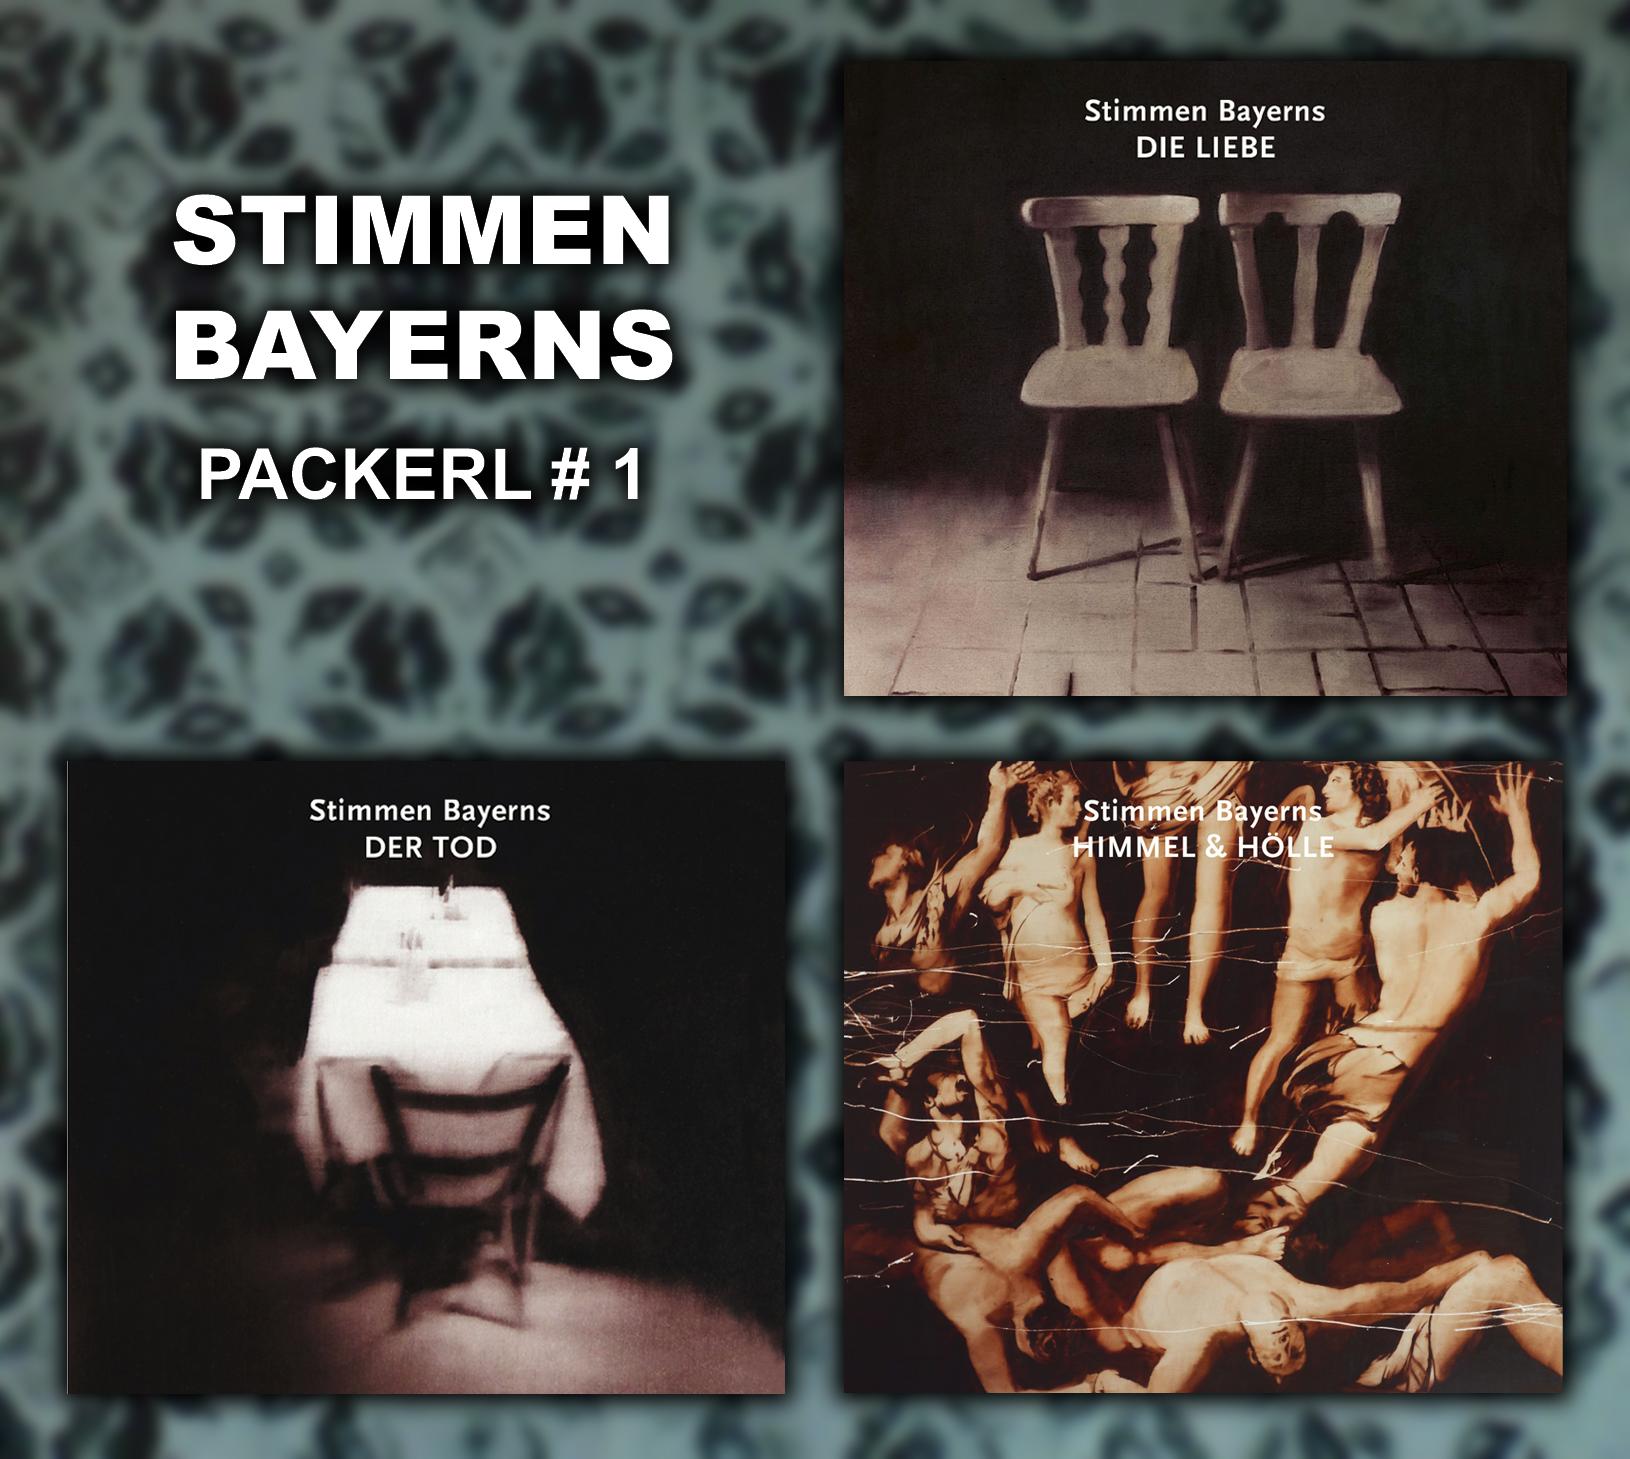 Stimmen Bayerns Packerl - Liebe, Tod, Himmel & Hölle